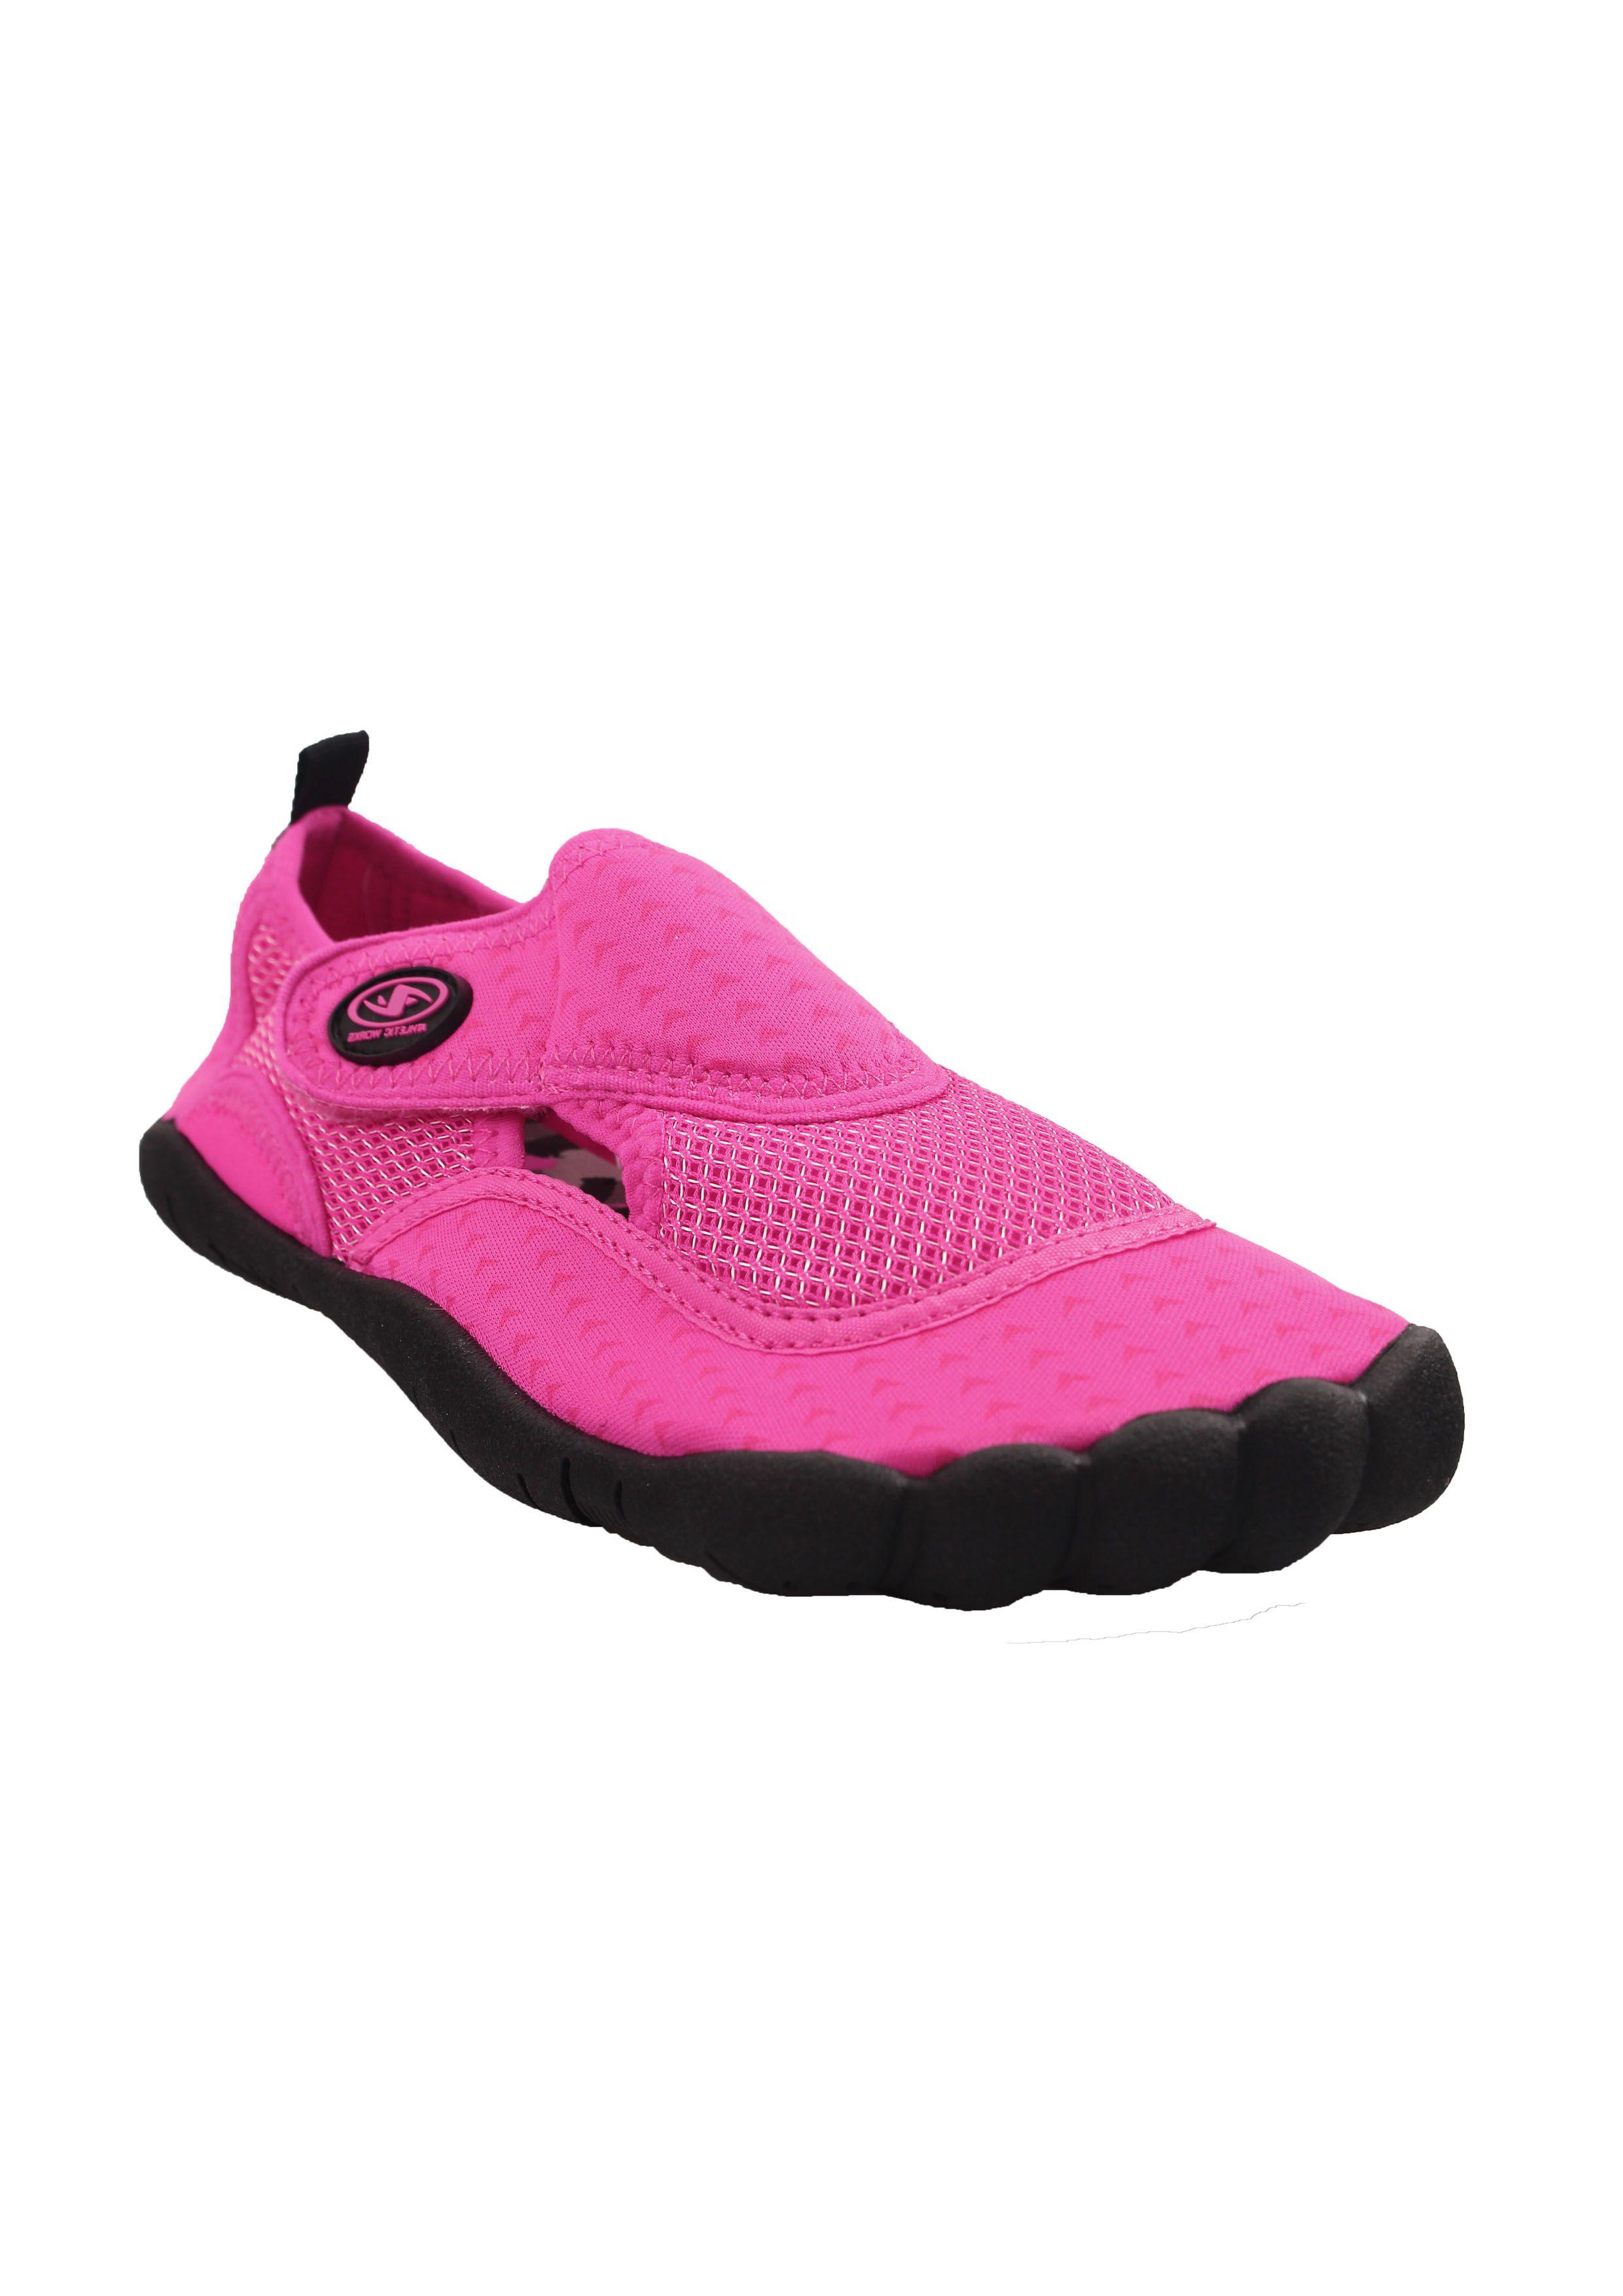 Athletic Works Women's Aqua Socks Water